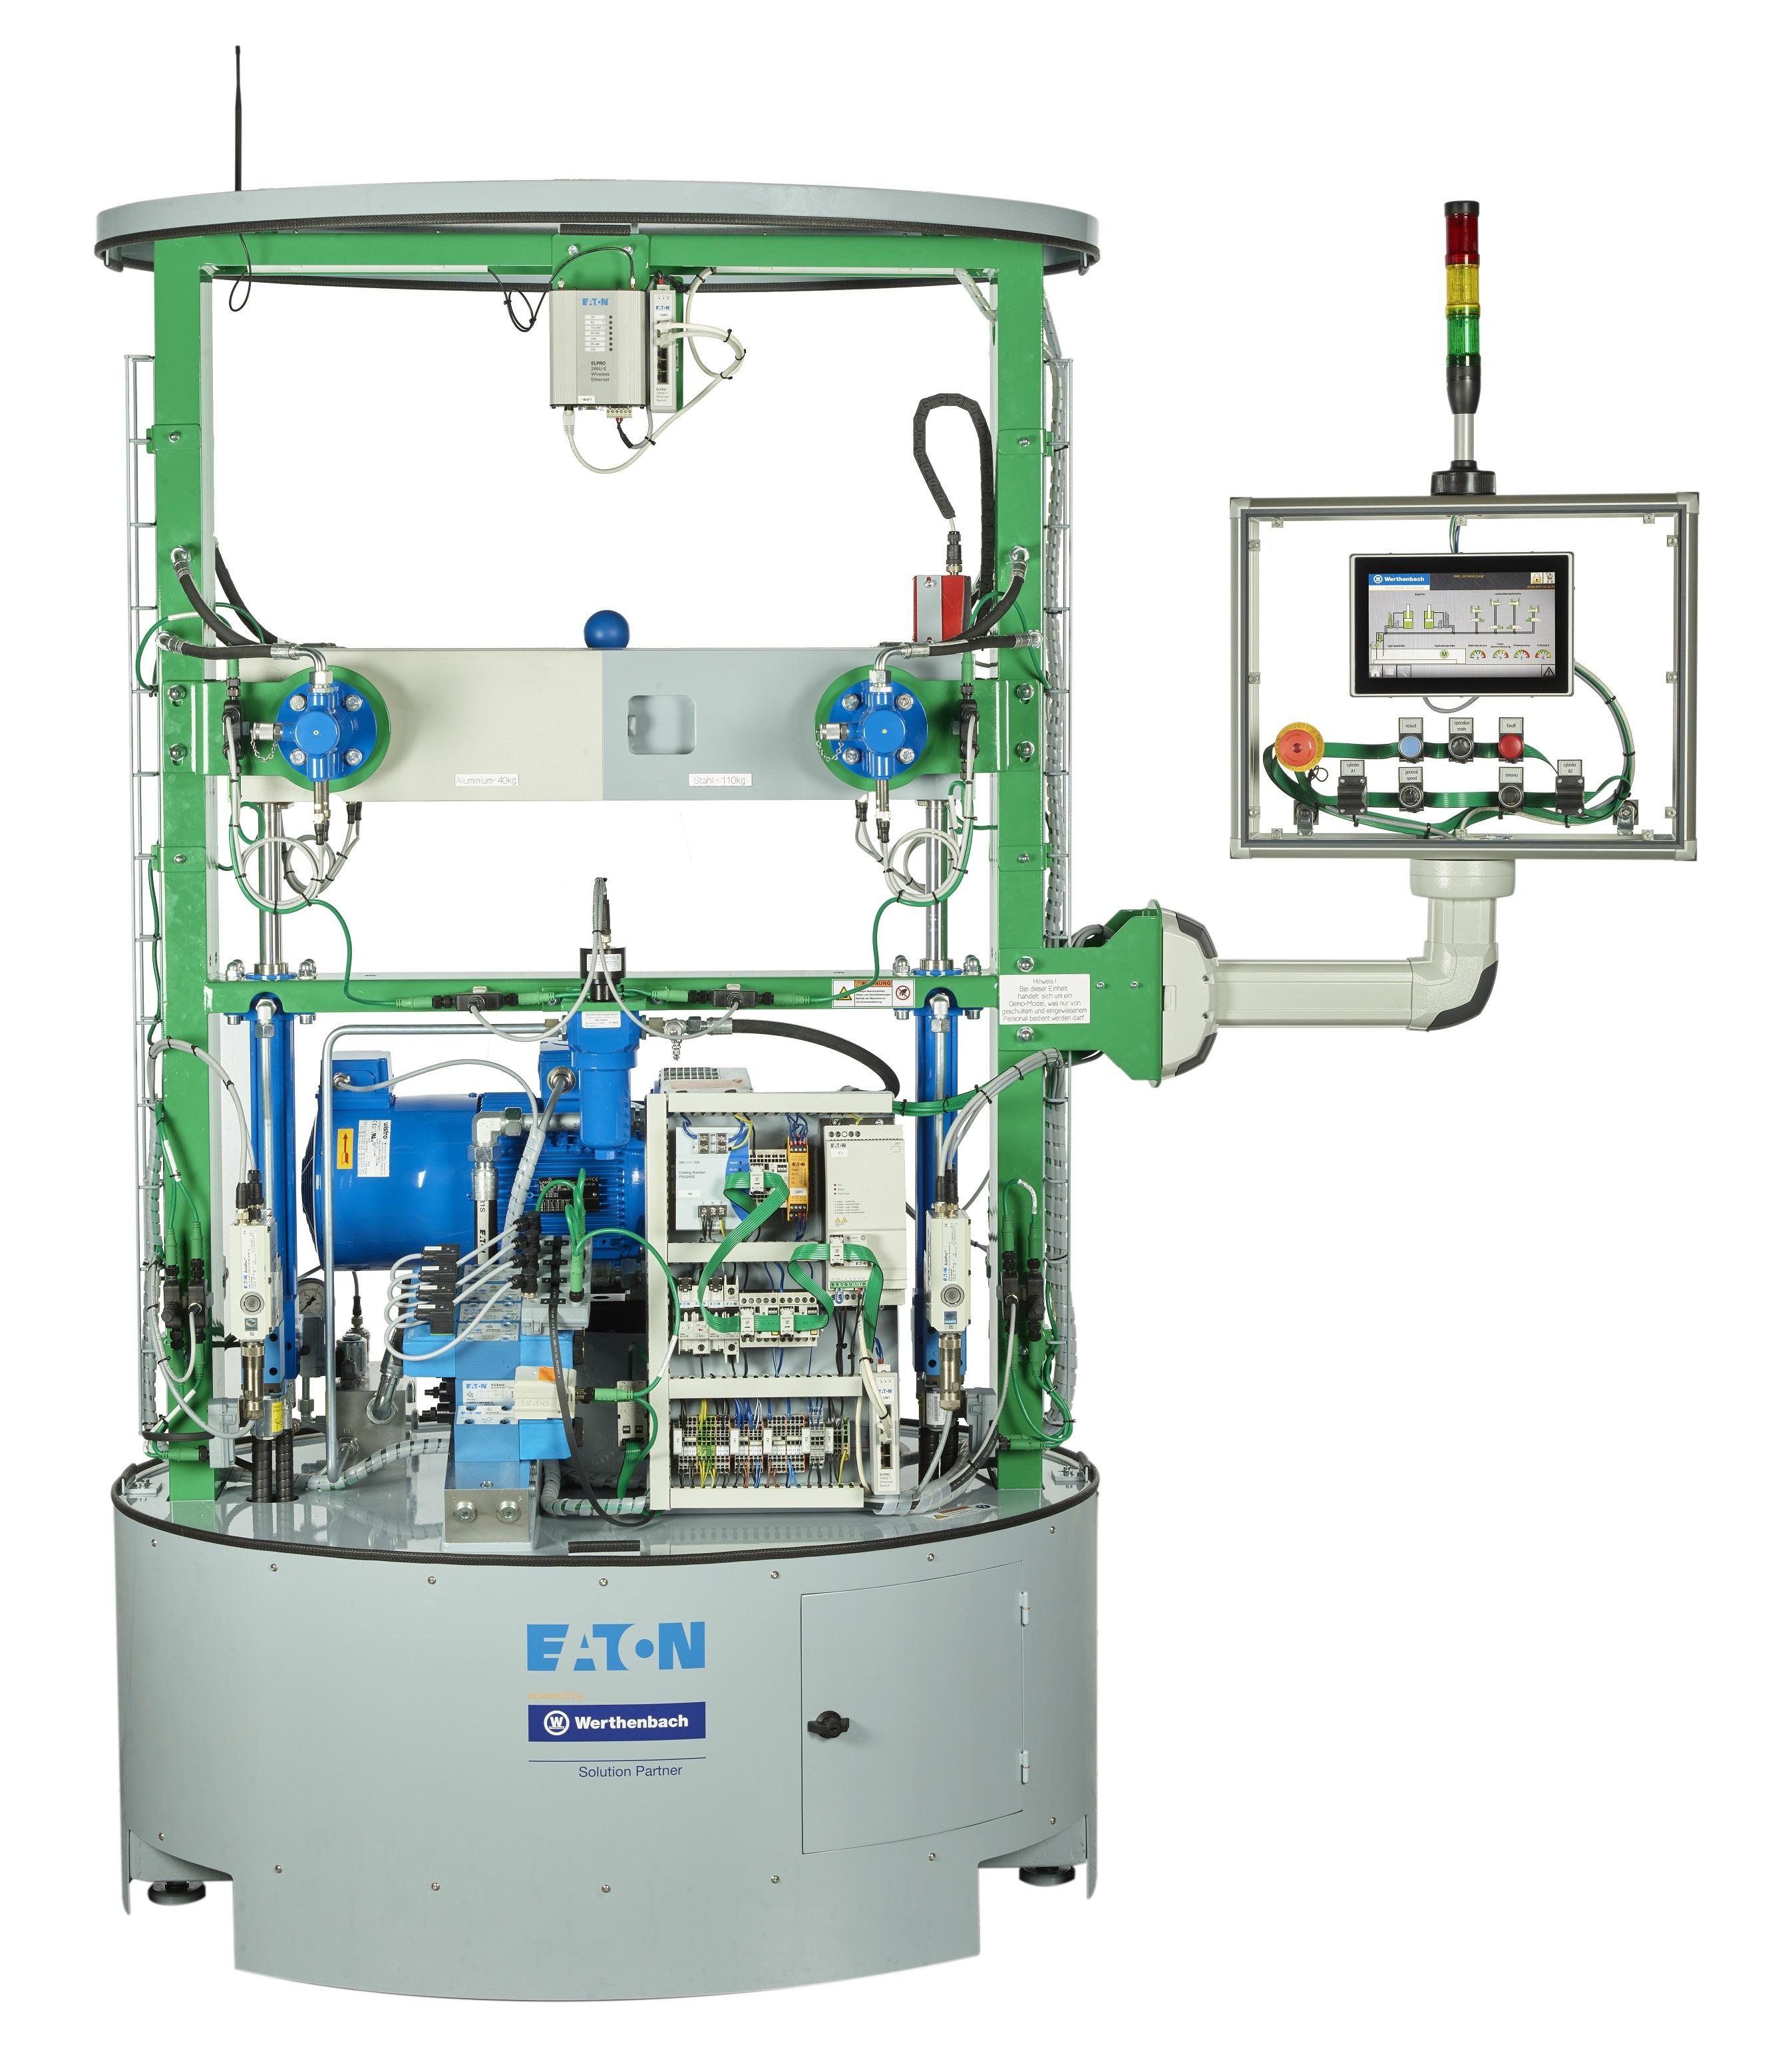 An electro hydraulic precision control machine - Power Transmission